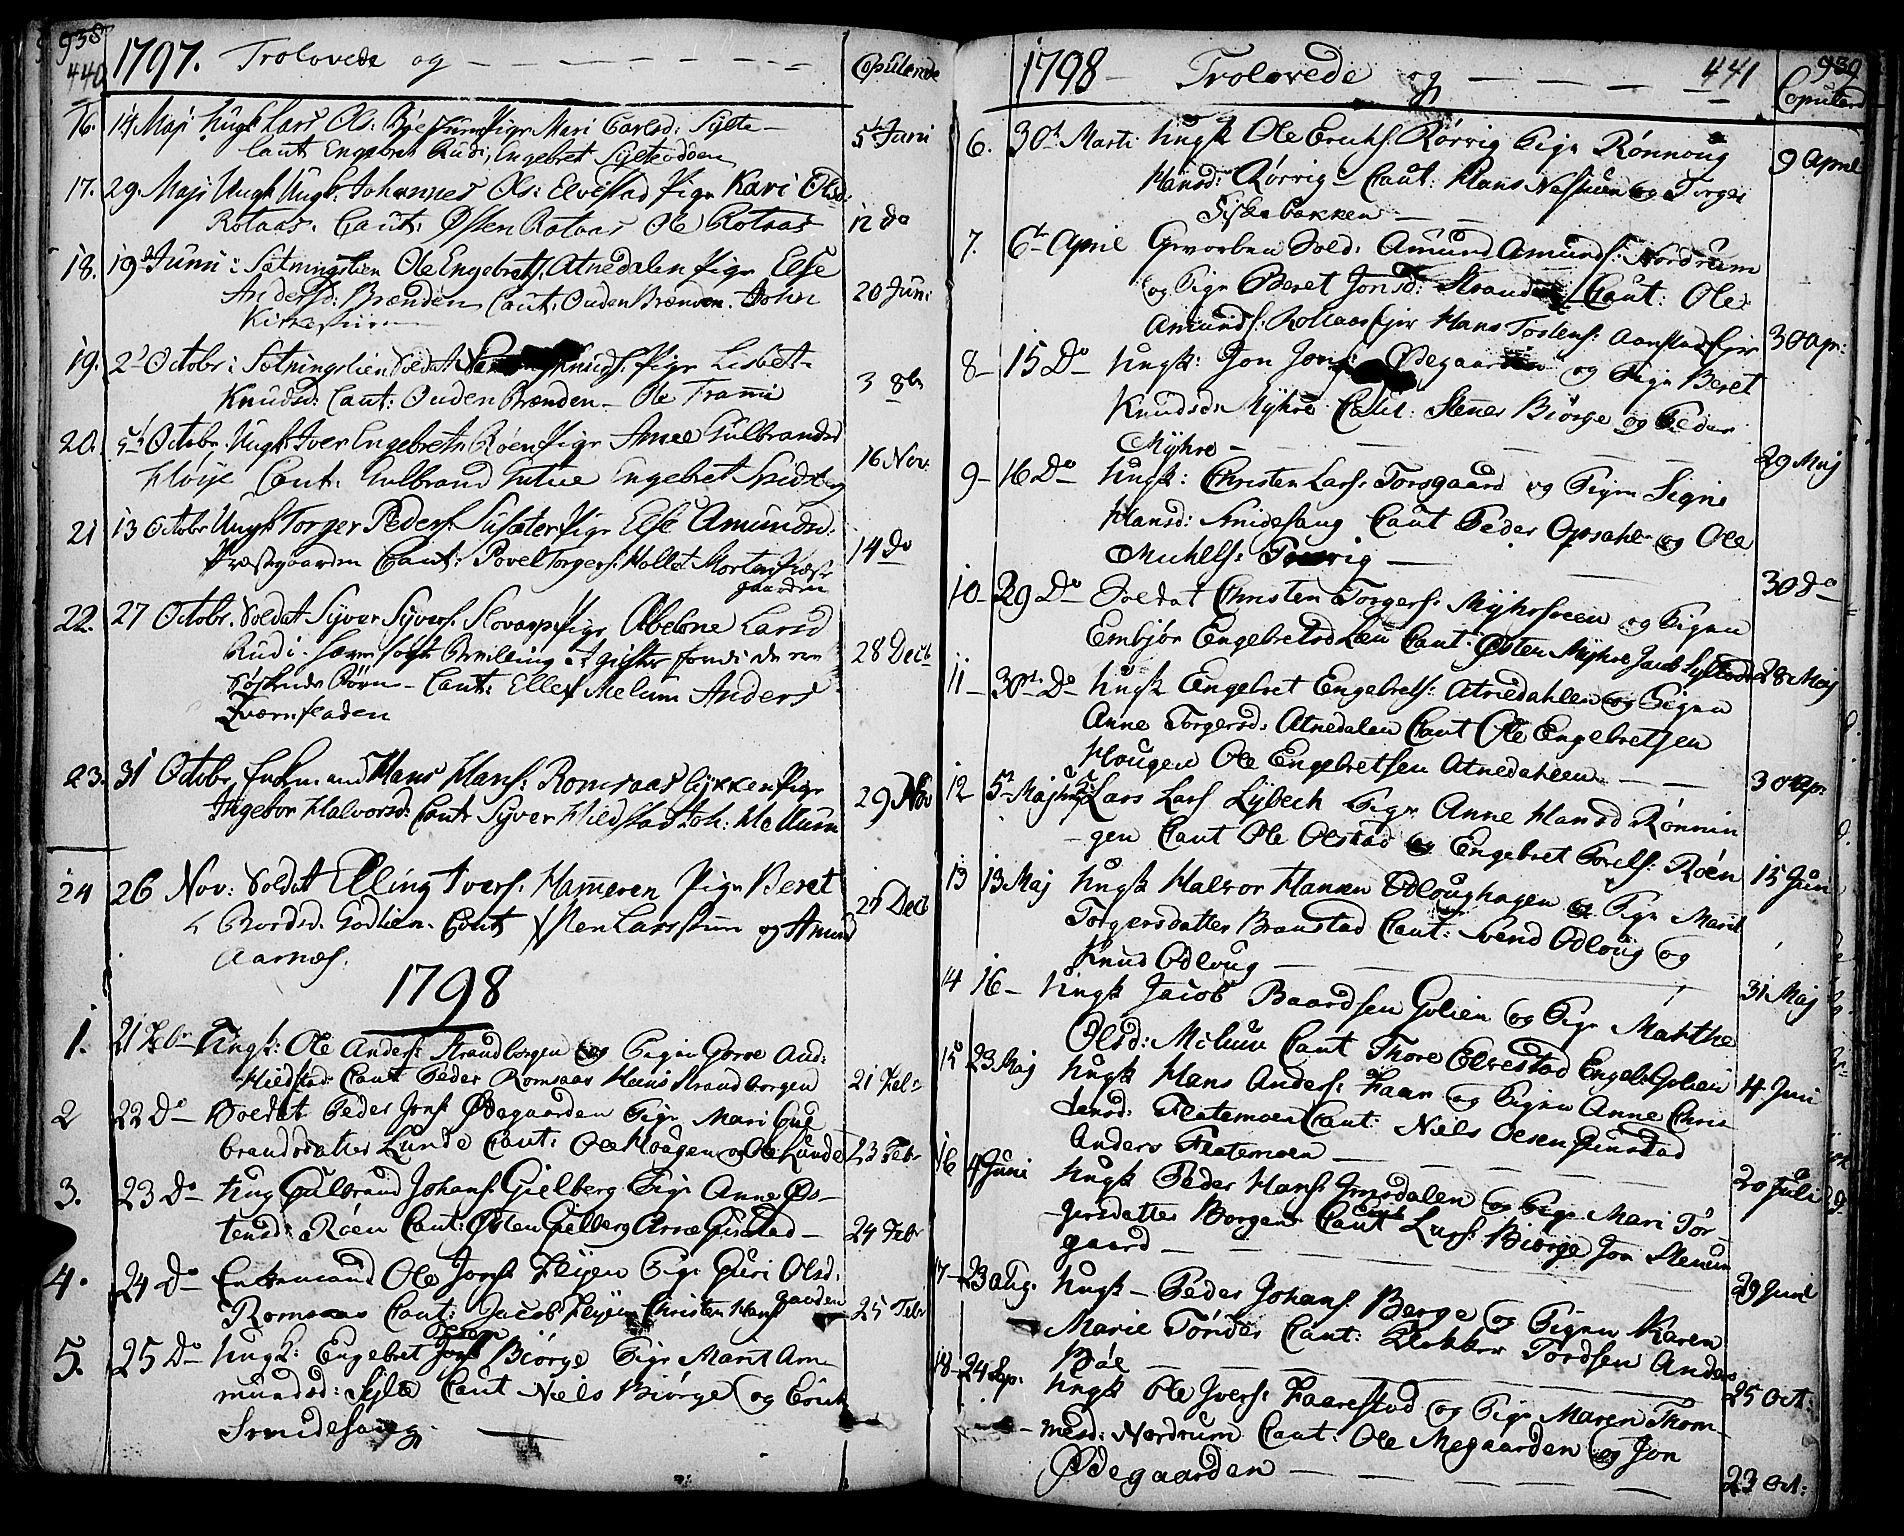 SAH, Ringebu prestekontor, Ministerialbok nr. 3, 1781-1820, s. 440-441